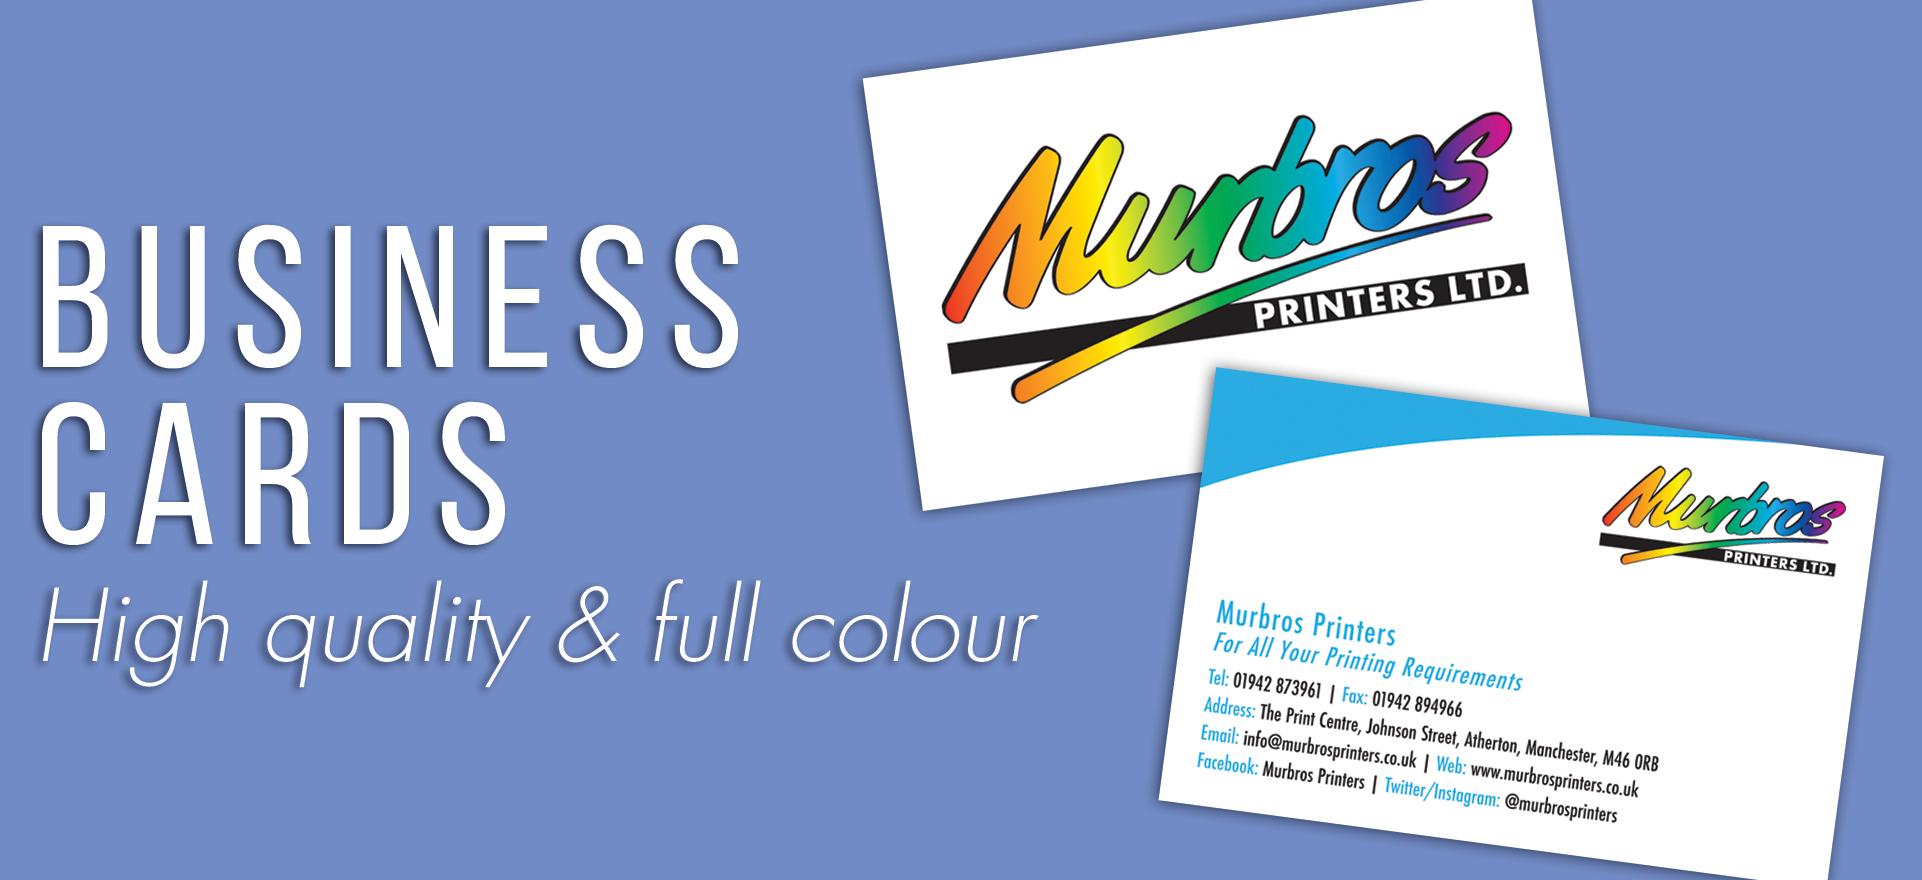 Murbros Printers – Professional Printing Solutions